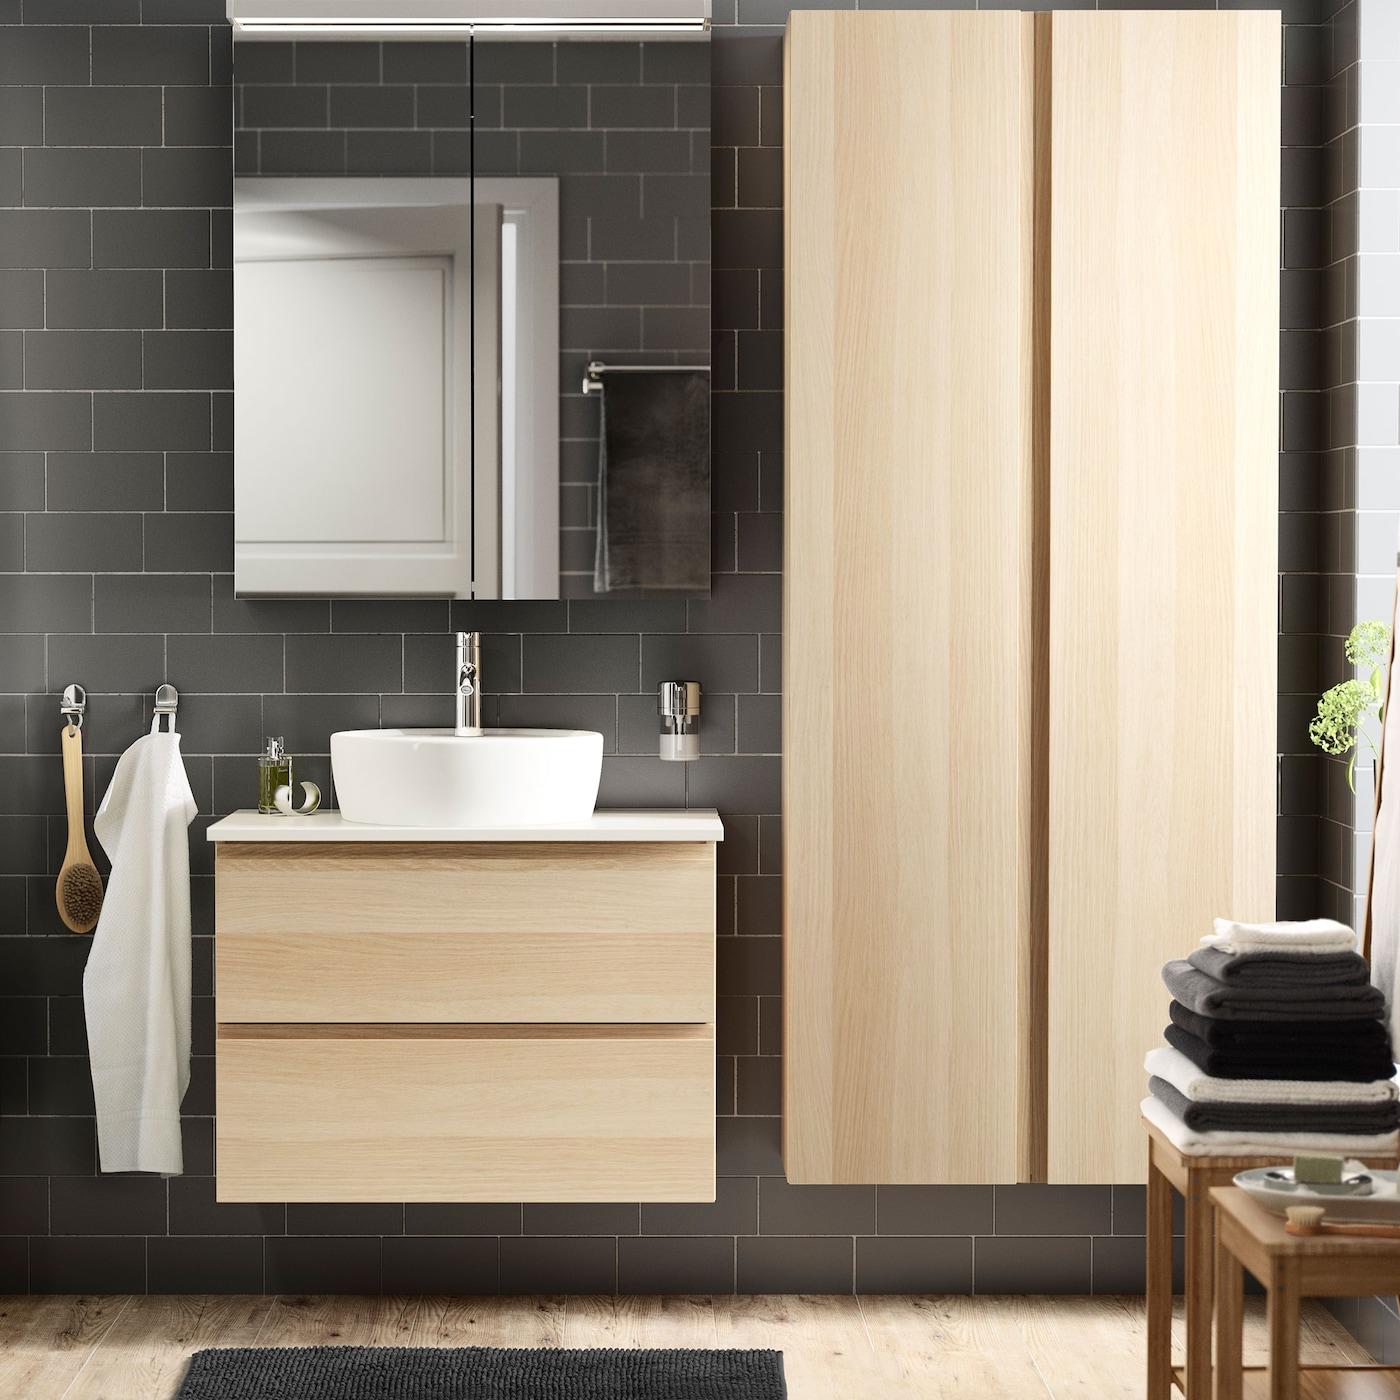 Salle De Bain : Serie GODMORGON IKEA